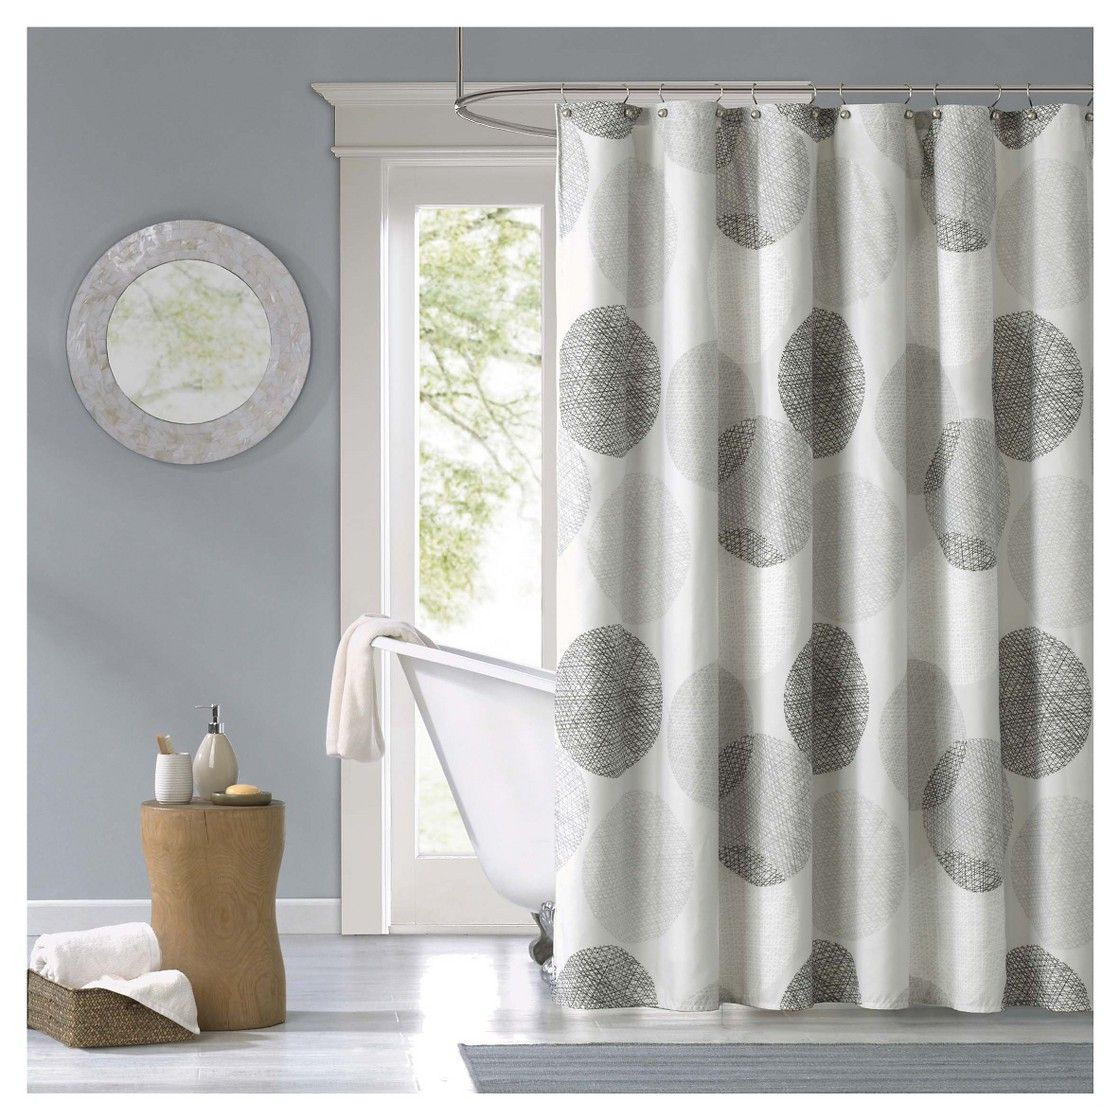 Cabrillo Geometric Print Microfiber Shower Curtain - Grey  For second floor bathroom